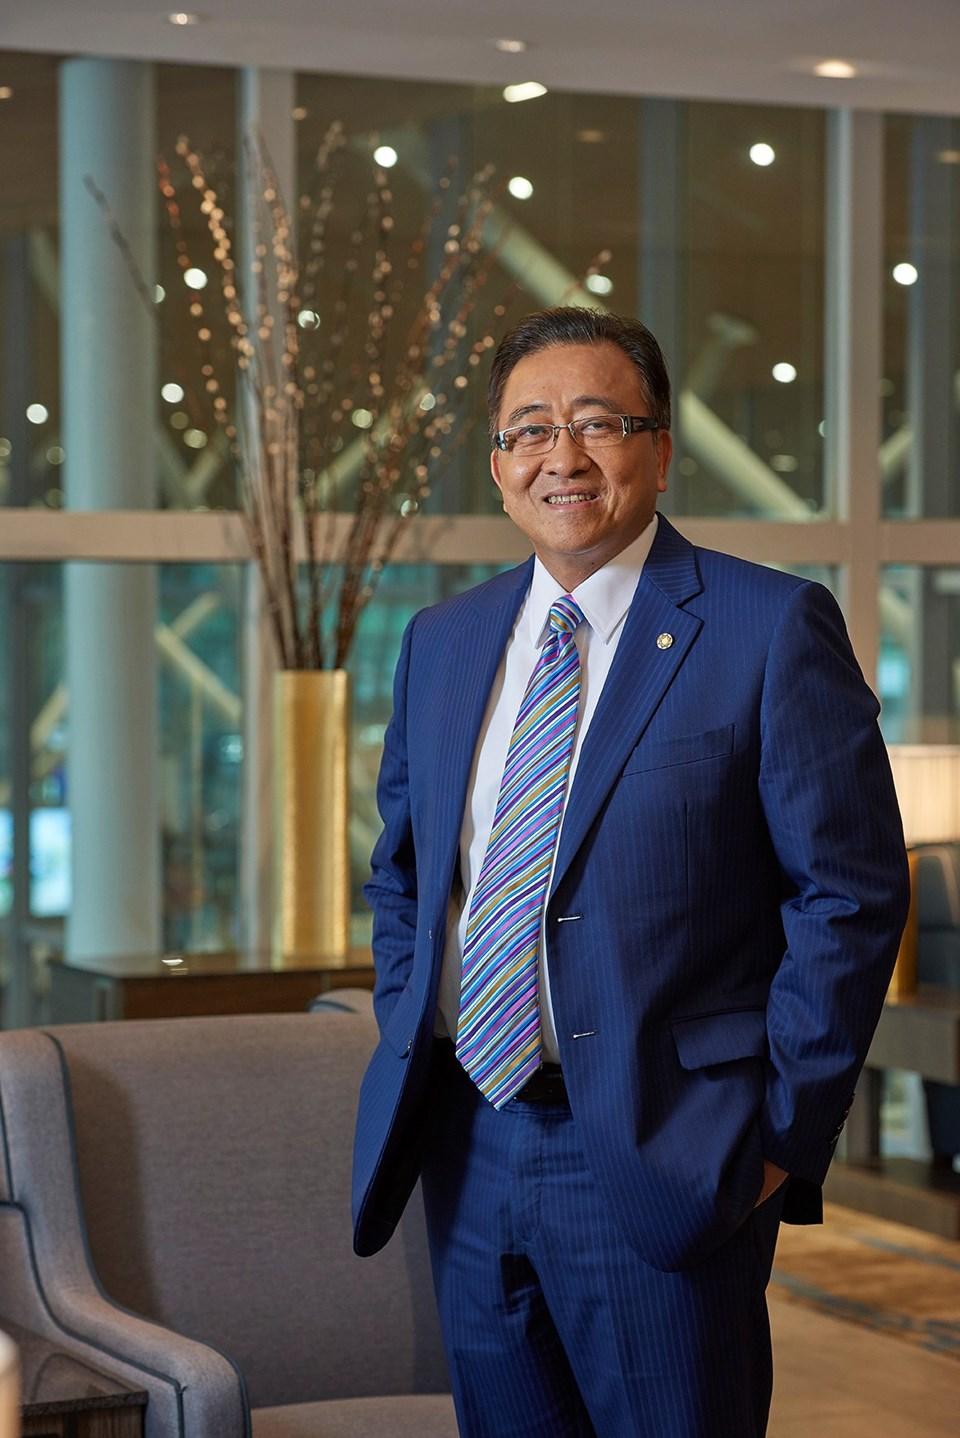 Plaza Premium Group'un Kurucusu ve Üst Yöneticisi (CEO) Song Hoi-see